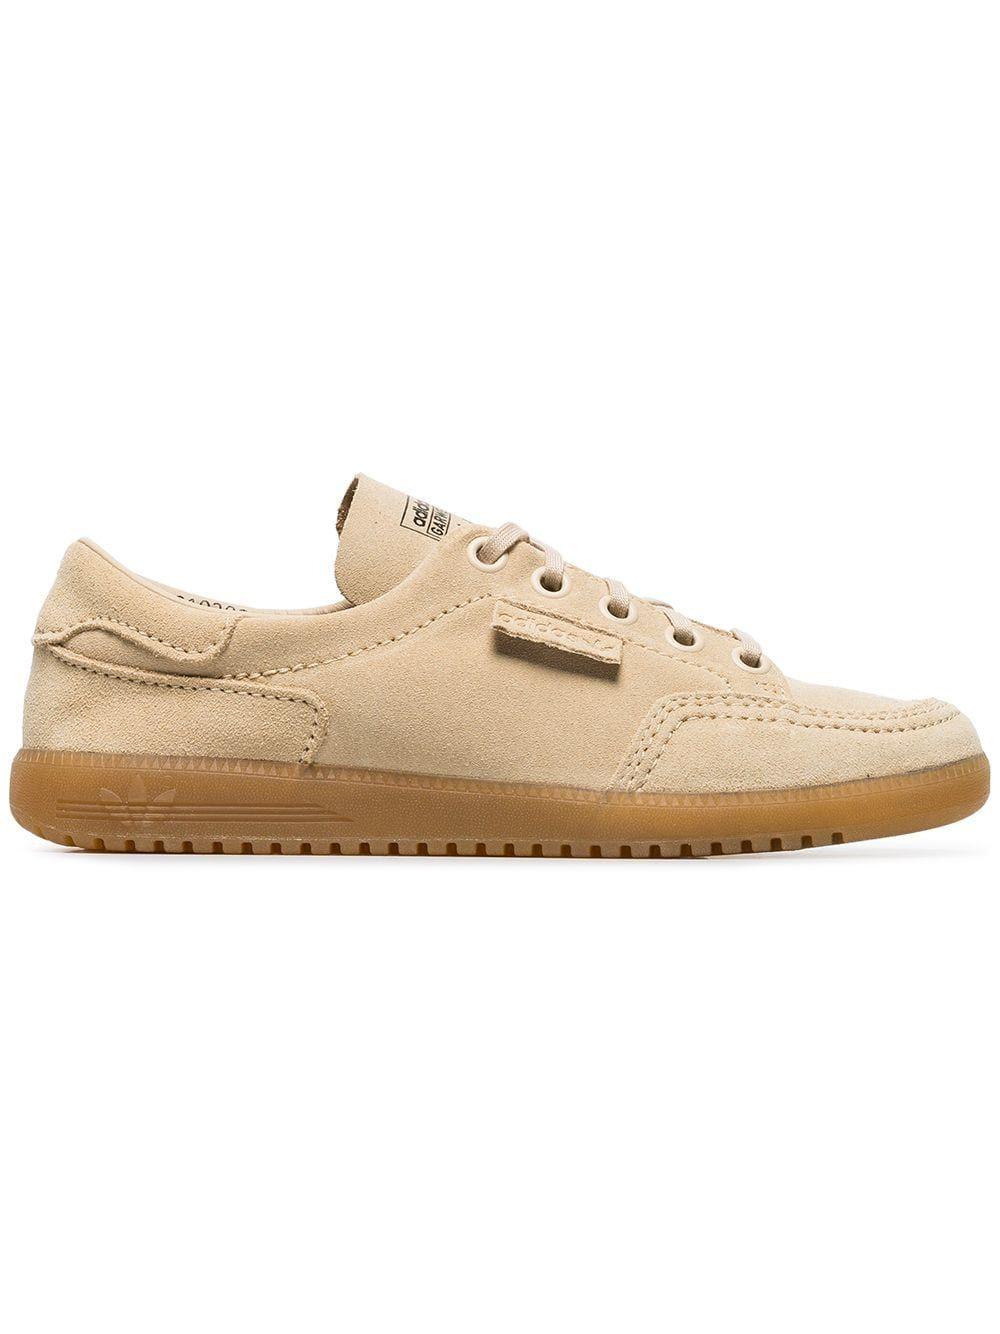 9a963f885d9 ADIDAS ORIGINALS ADIDAS GARWEN SPZL X UNION SNEAKERS - BROWN.   adidasoriginals  shoes